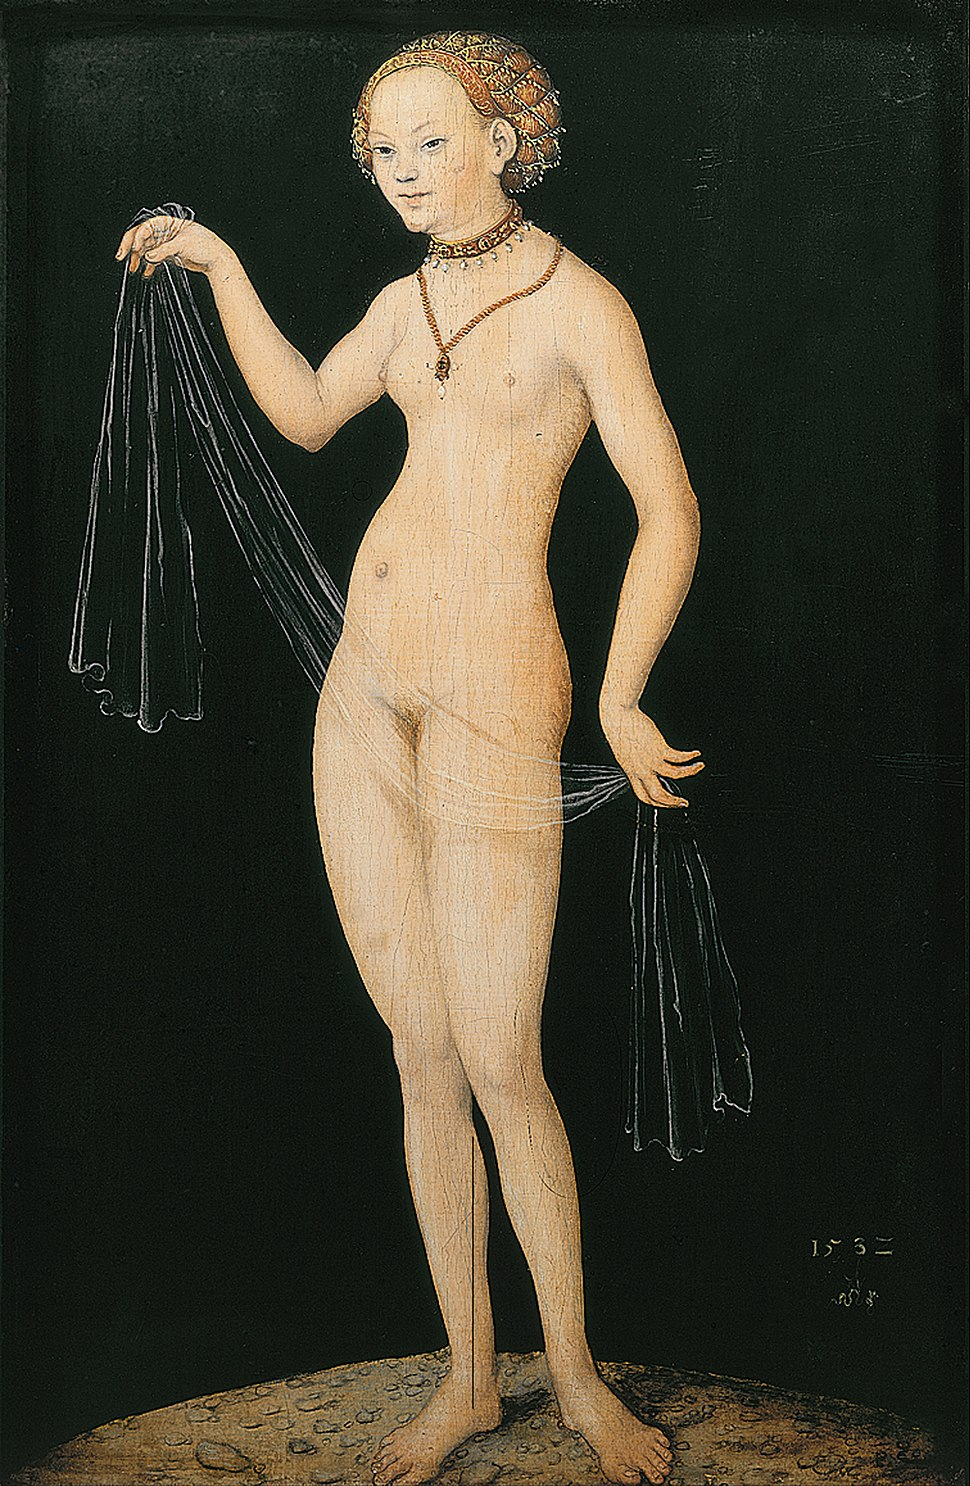 Lucas Cranach the Elder - Venus - Google Art Project.jpg